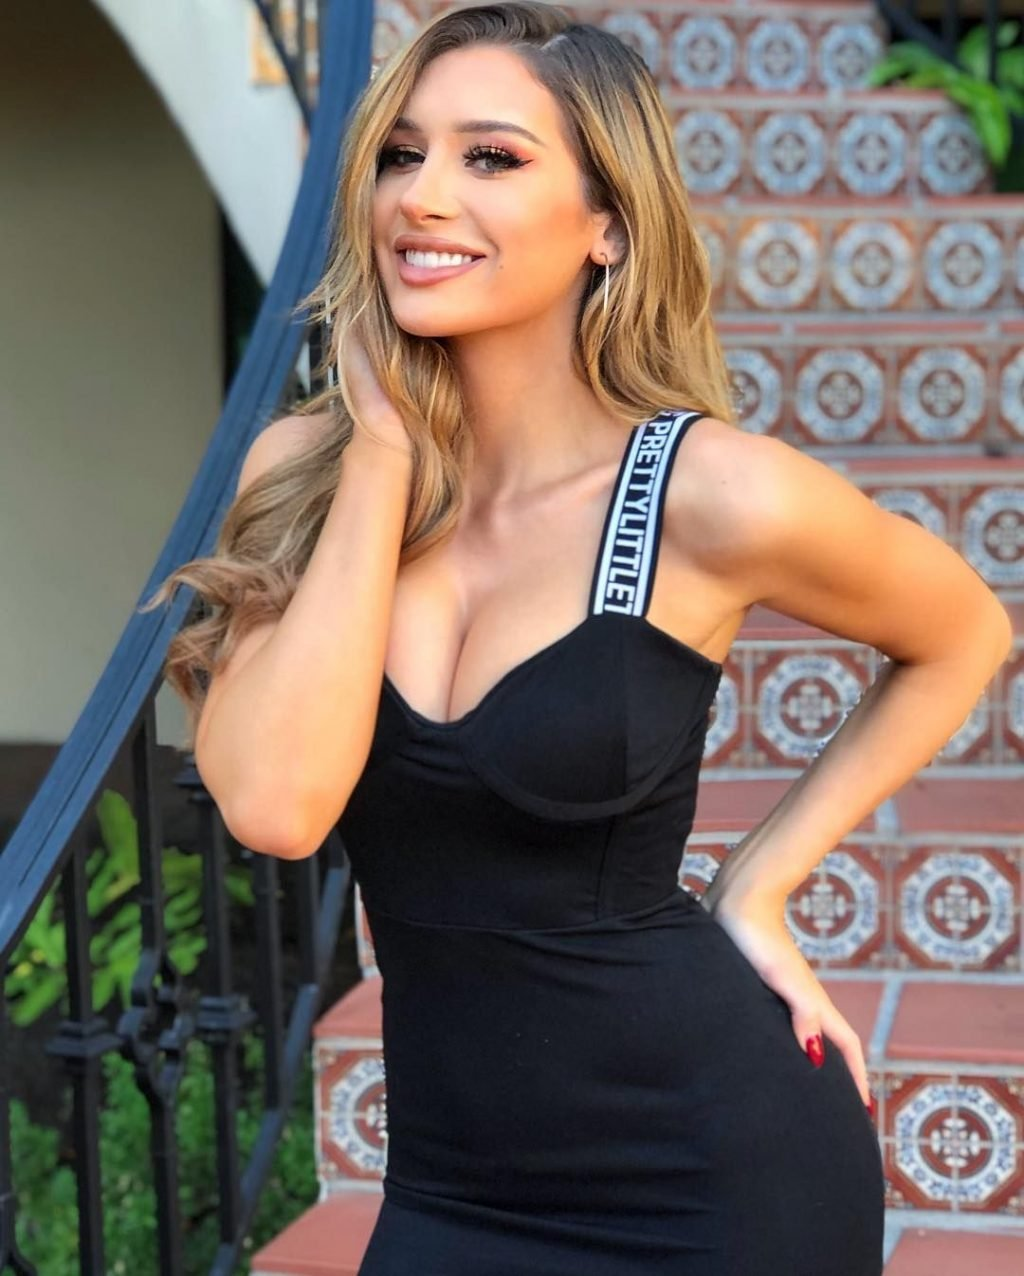 Sexy illinois wife molly nude